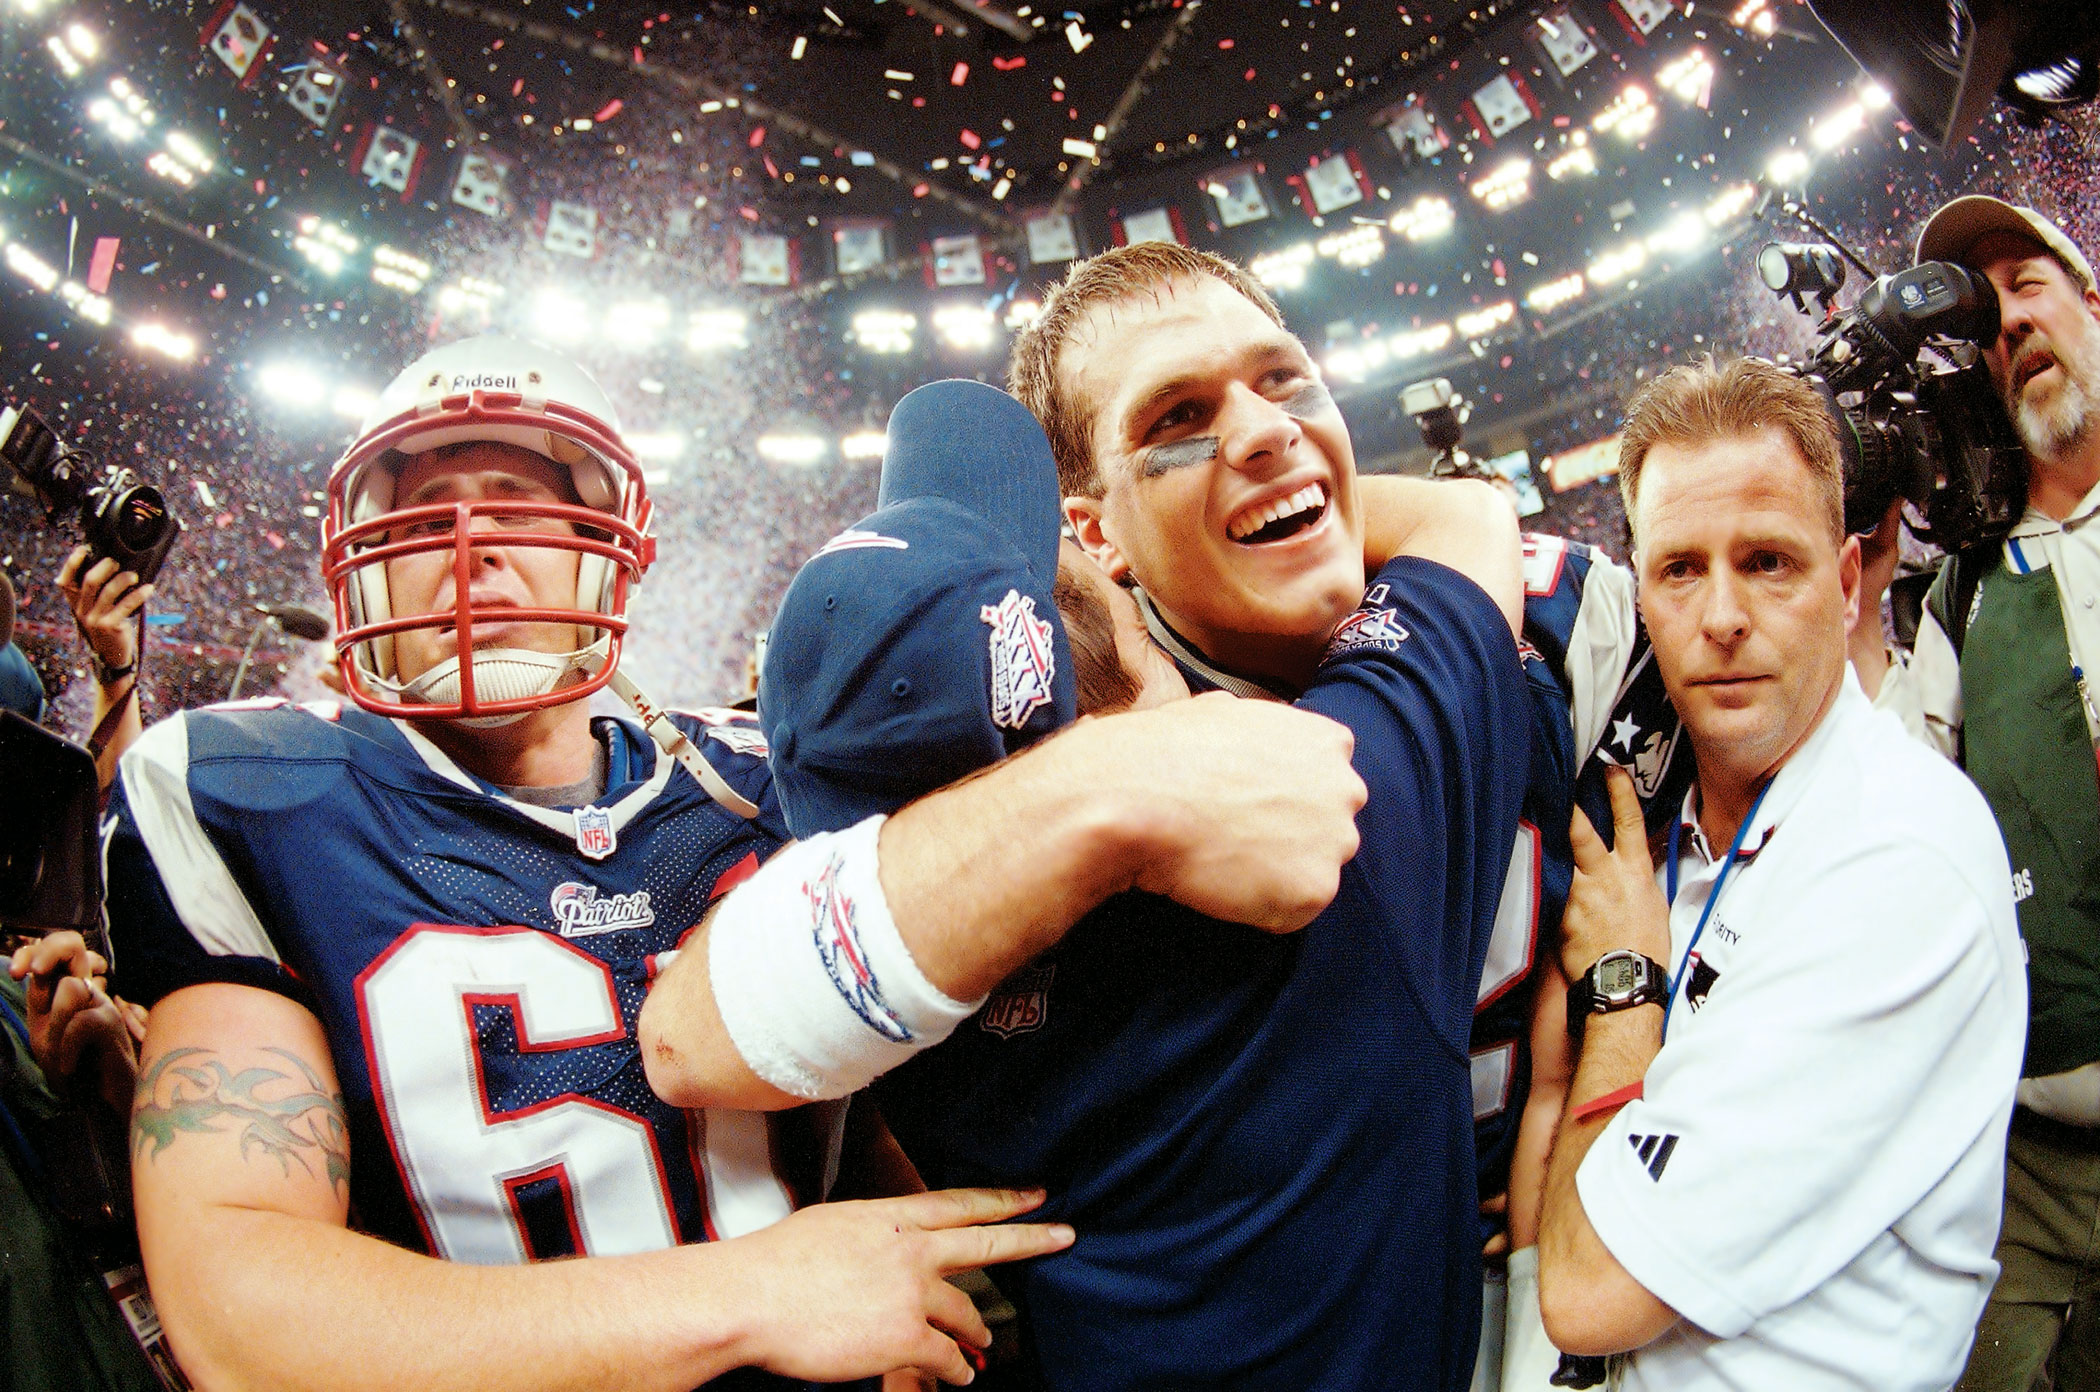 Super Bowl XXXVI, Feb. 3, 2002                               New England Patriots vs St. Louis Rams in New Orleans